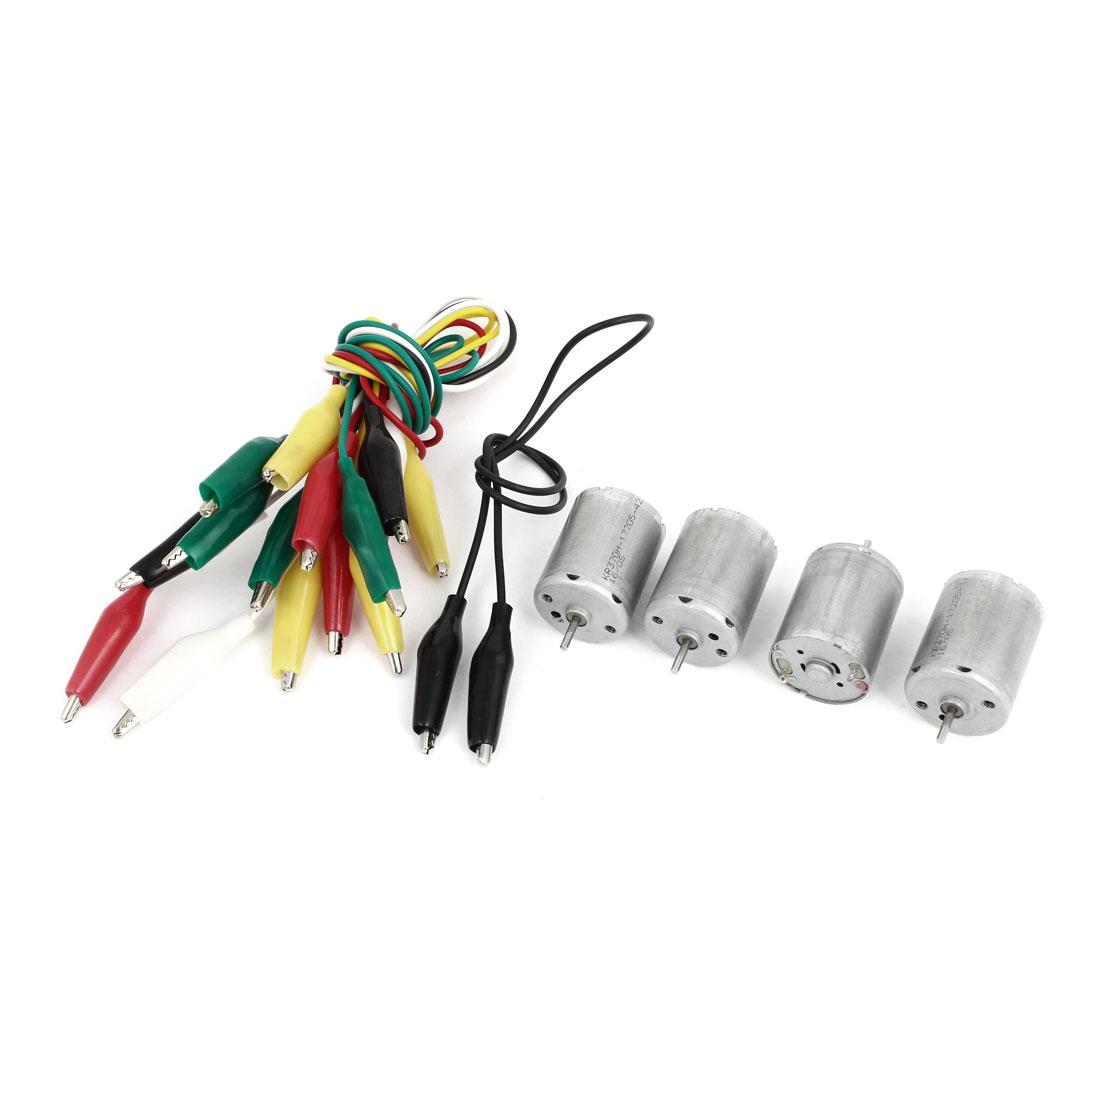 4Pcs DC 6V 9000RPM 2 Terminals Type 370 Miniature Mini Electric Motor w Alligator Clip Cable